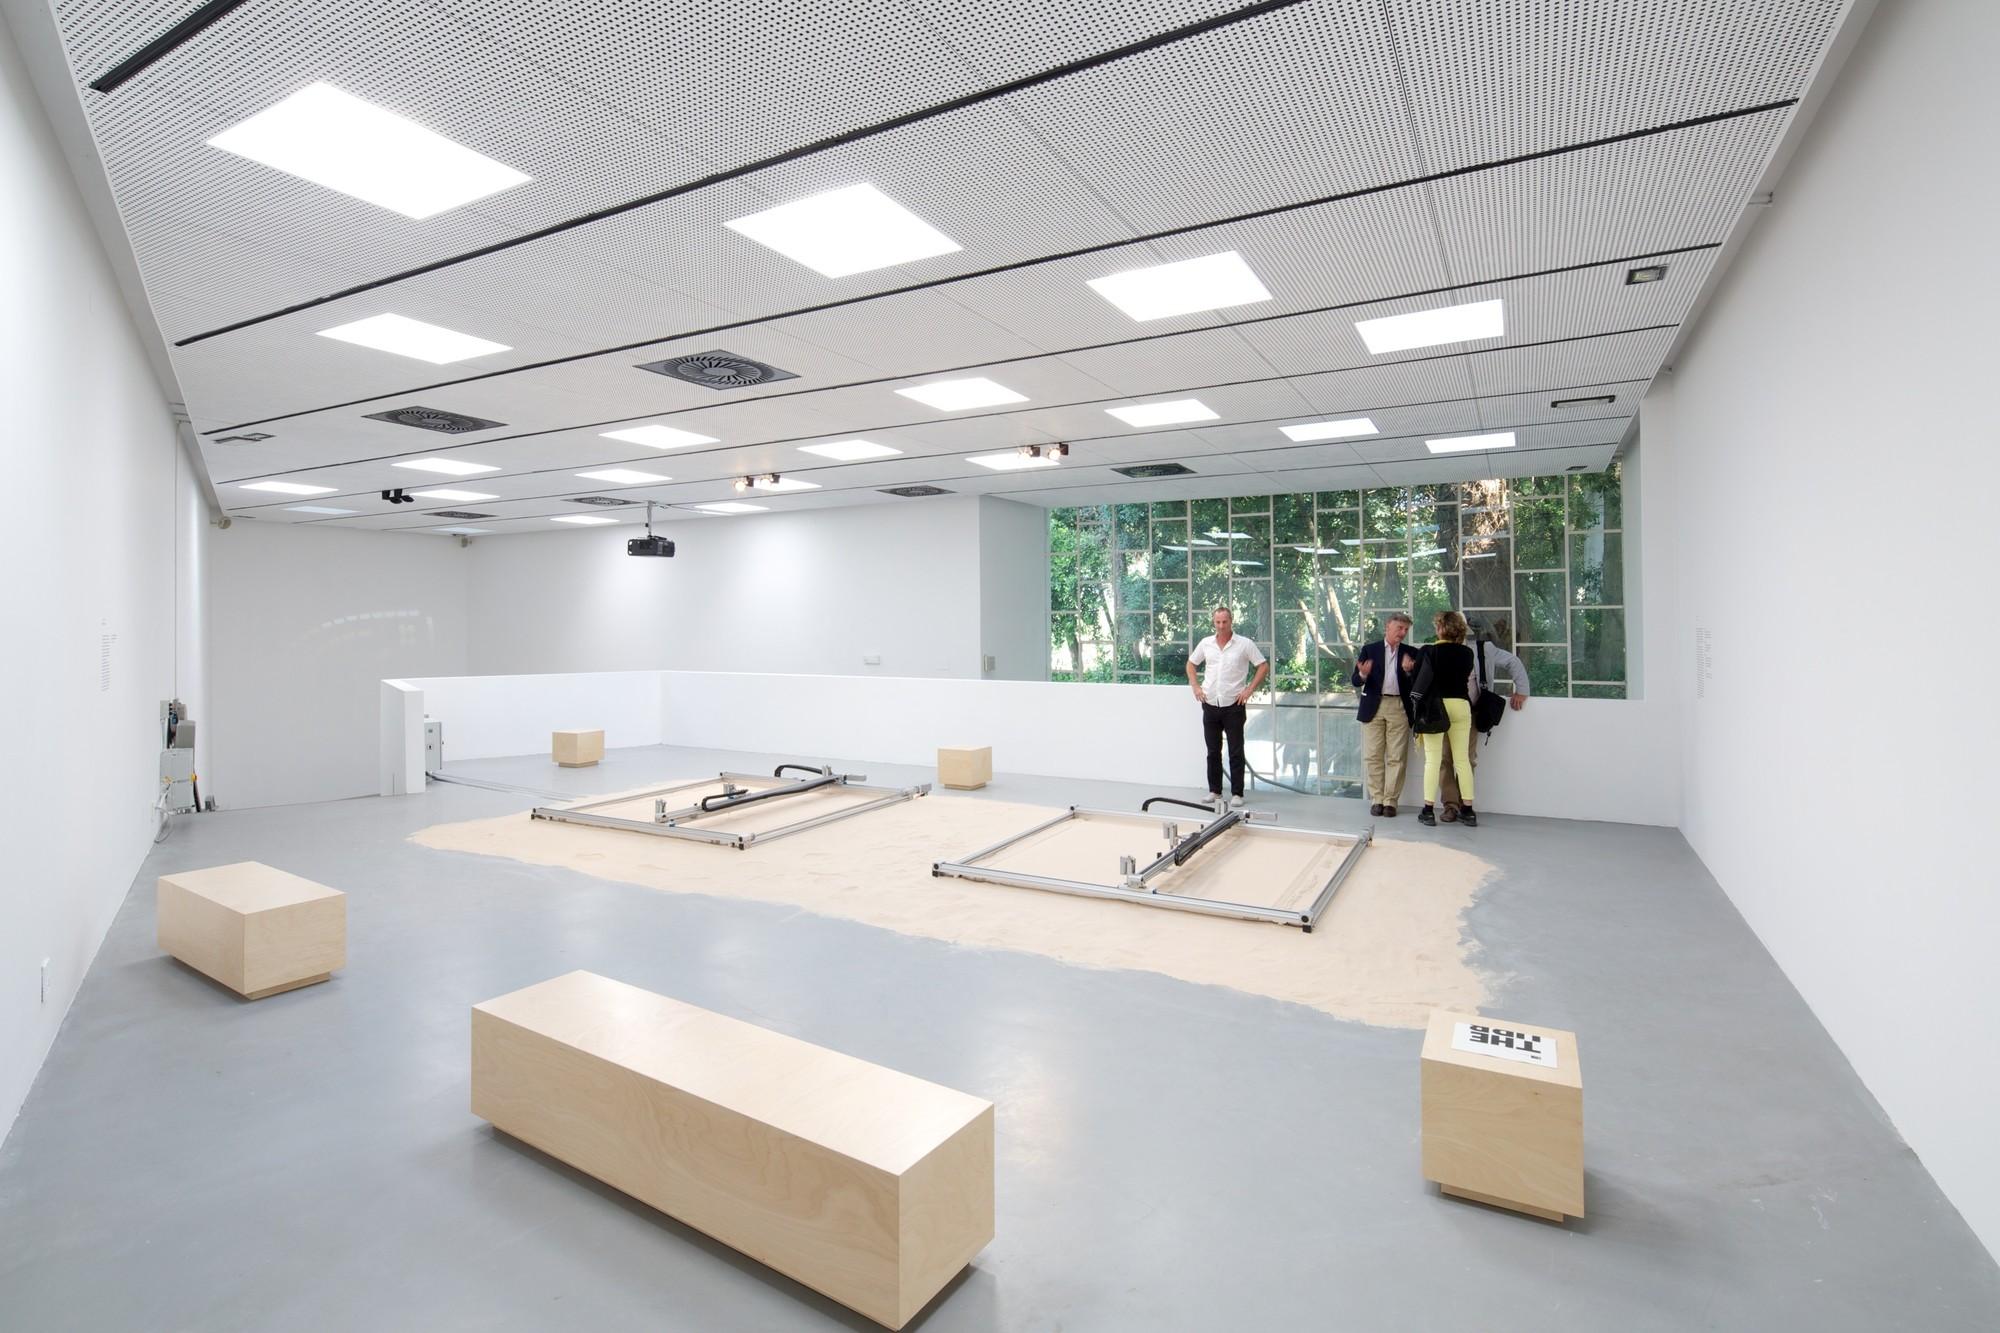 Venice Biennale 2014: Israel's Tabula Rasa, © Nico Saieh